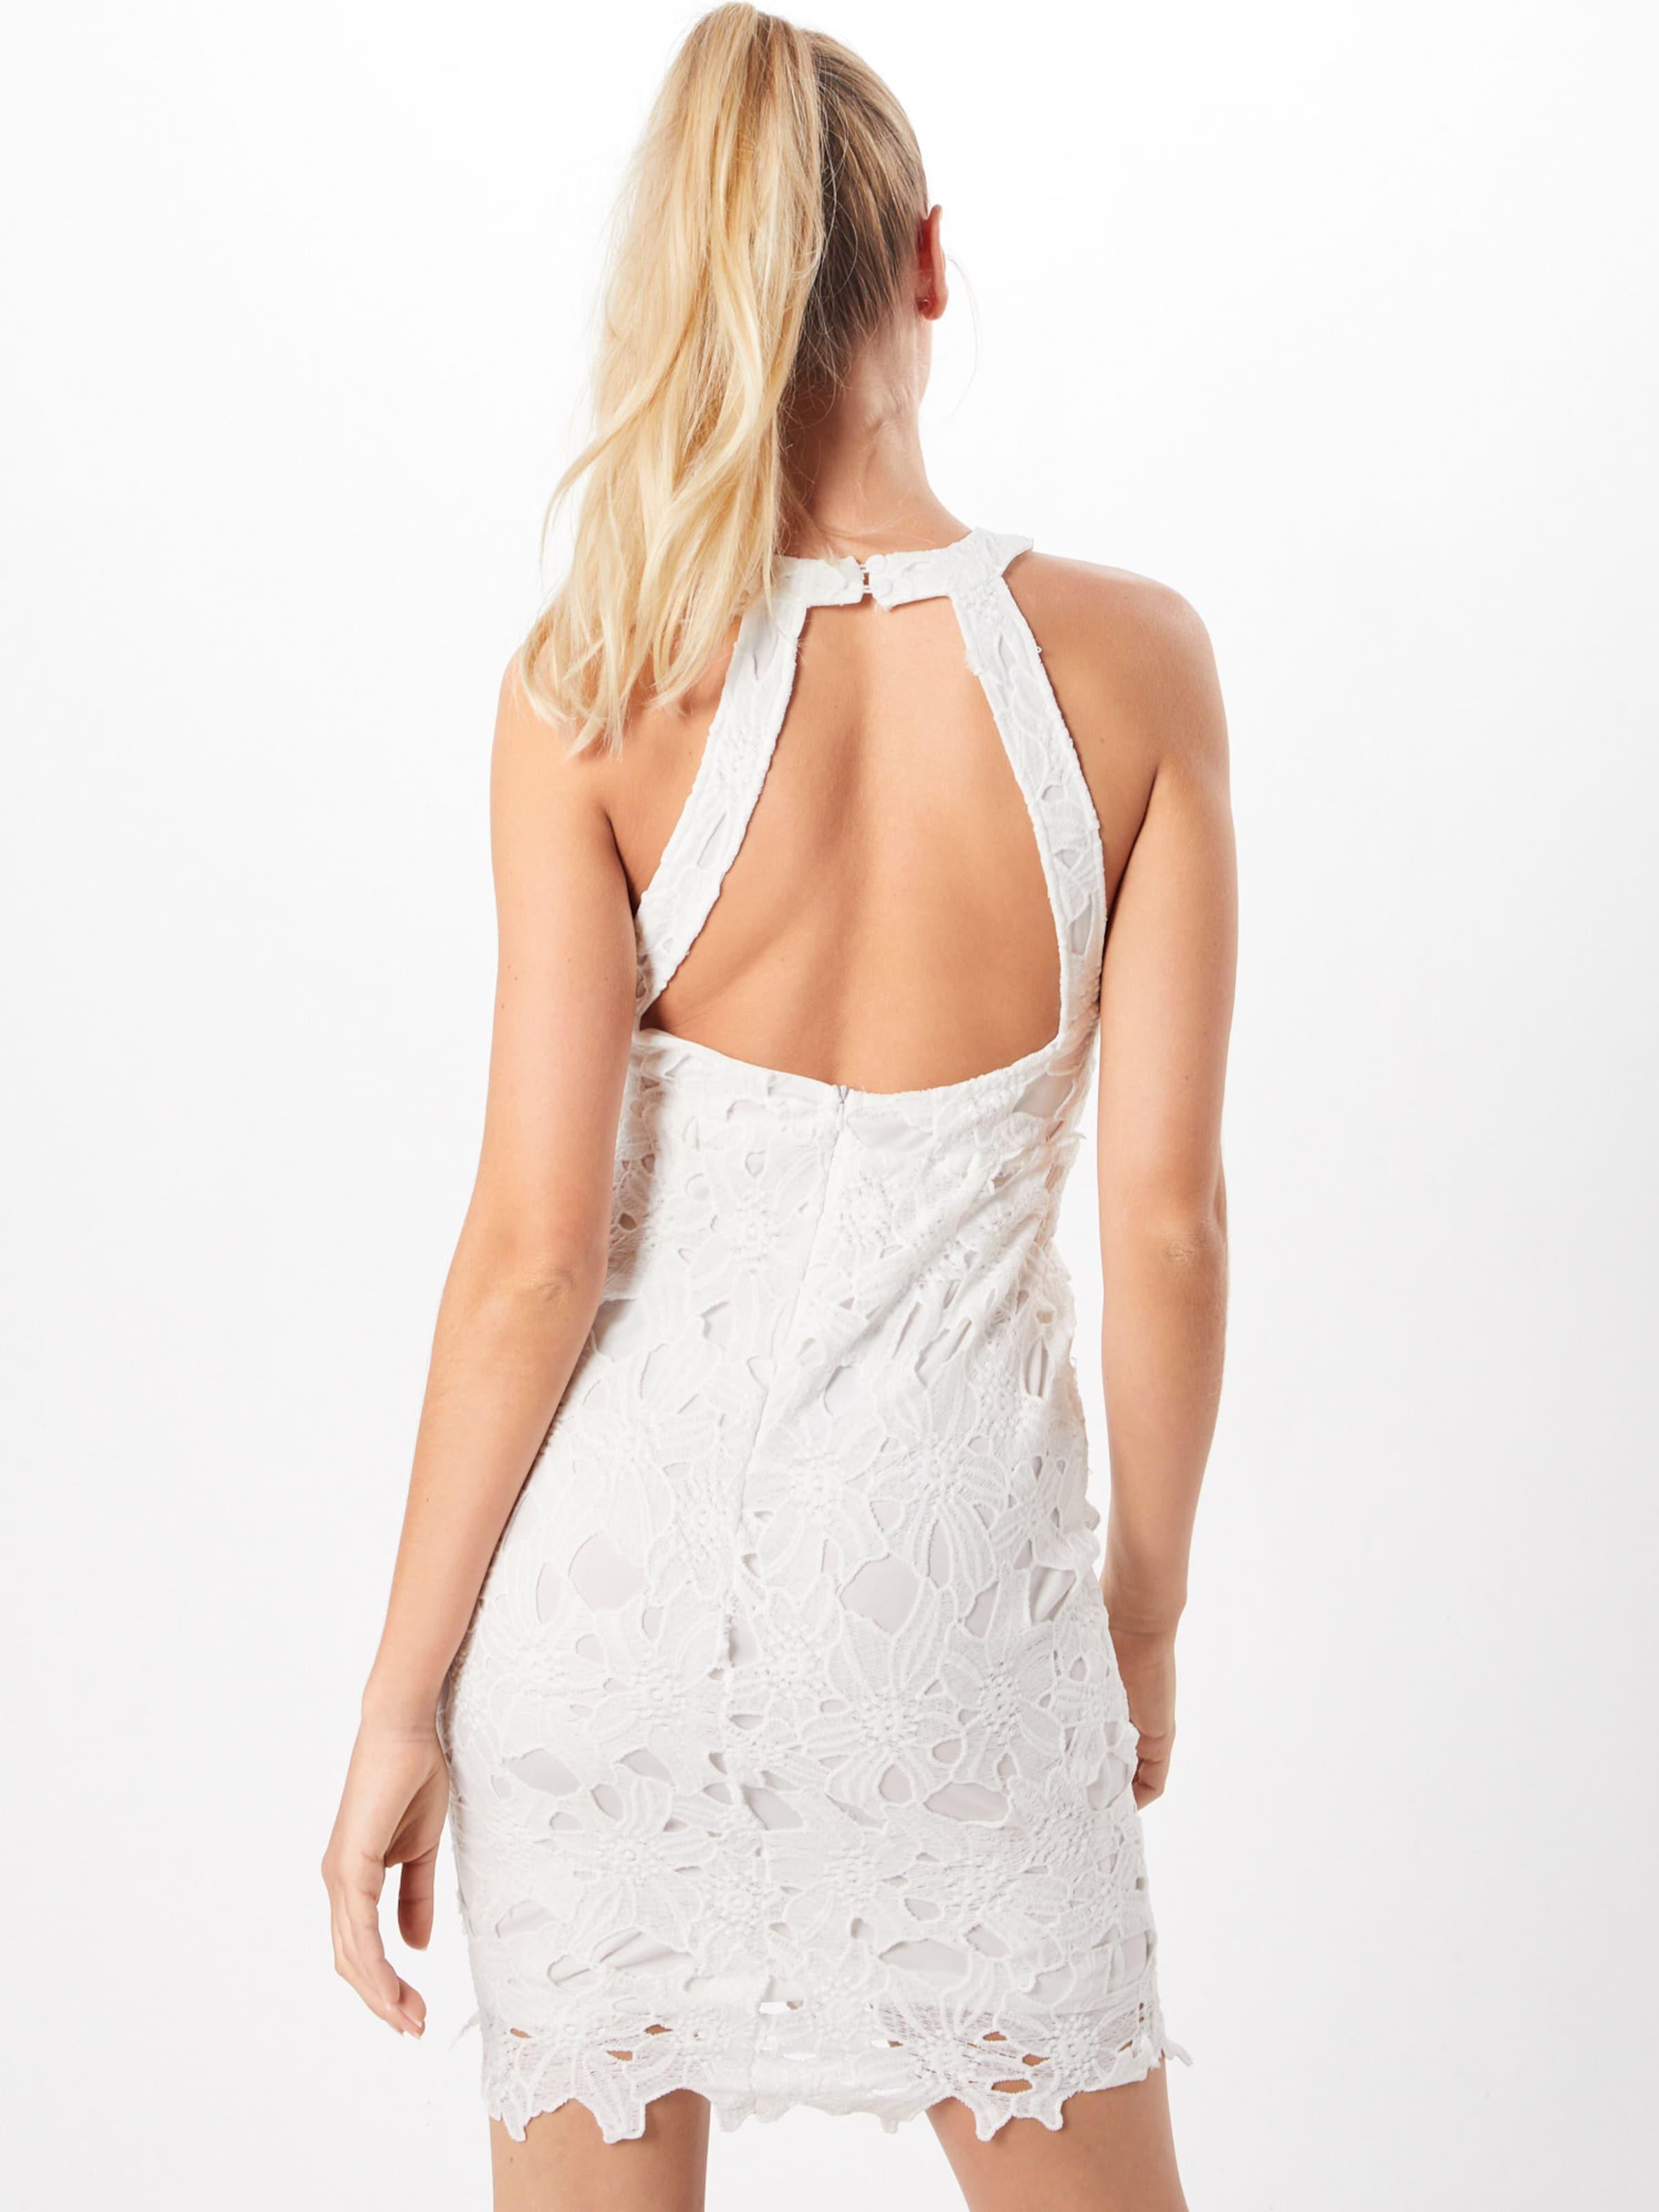 Missguided Missguided Weiß Kleid In In Missguided Kleid Kleid Weiß Weiß In Missguided 54Aj3RLq